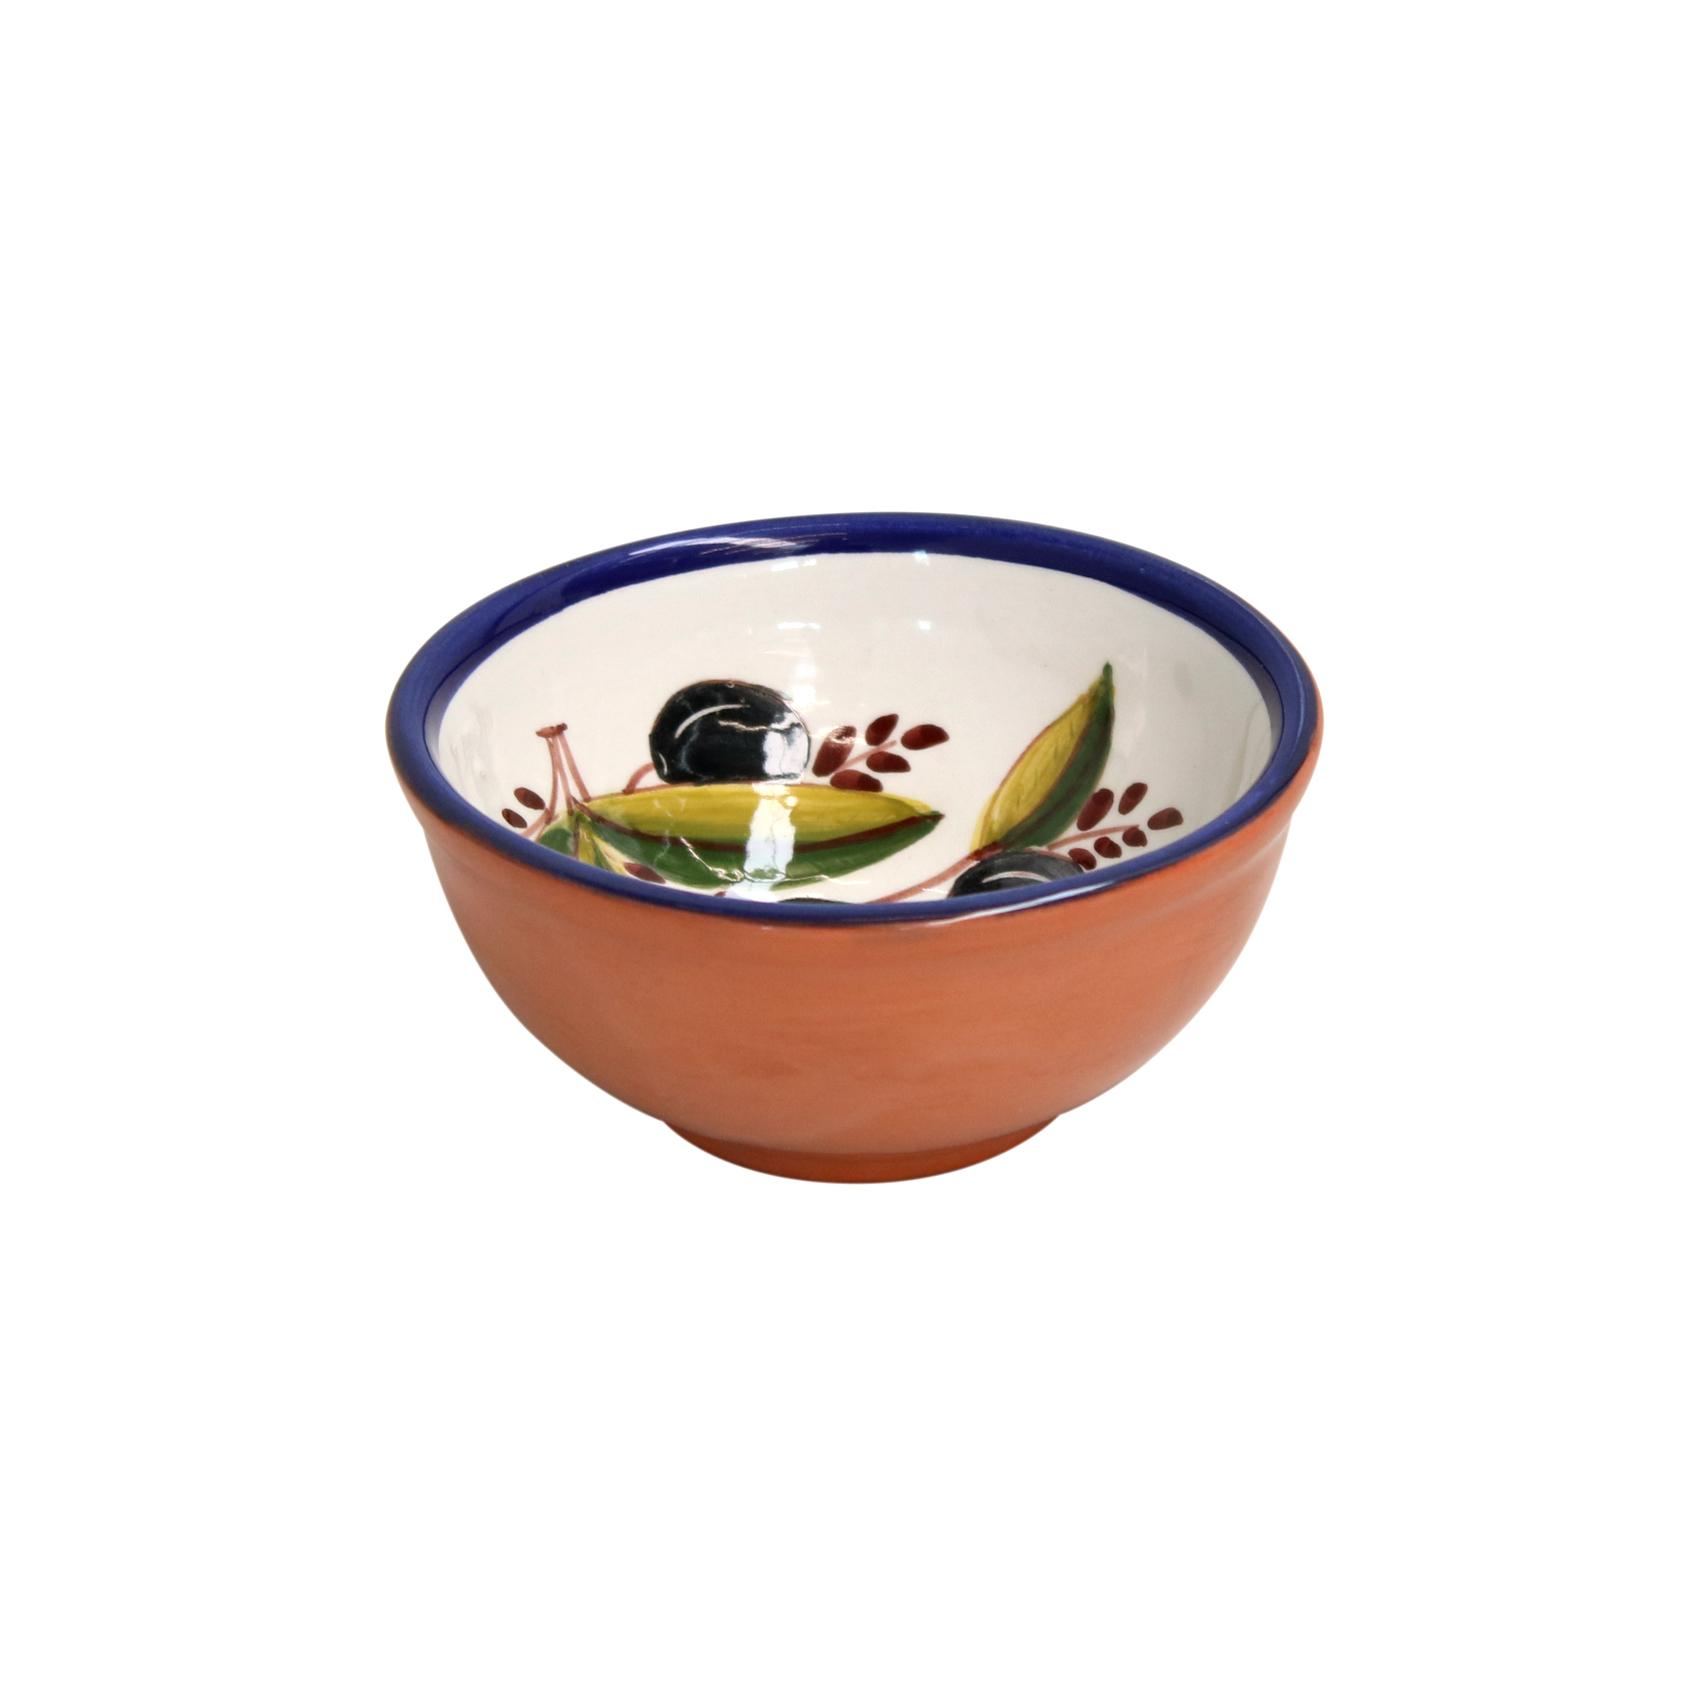 Casafina Alentejo Terracotta Giftware Olive Dip Bowl